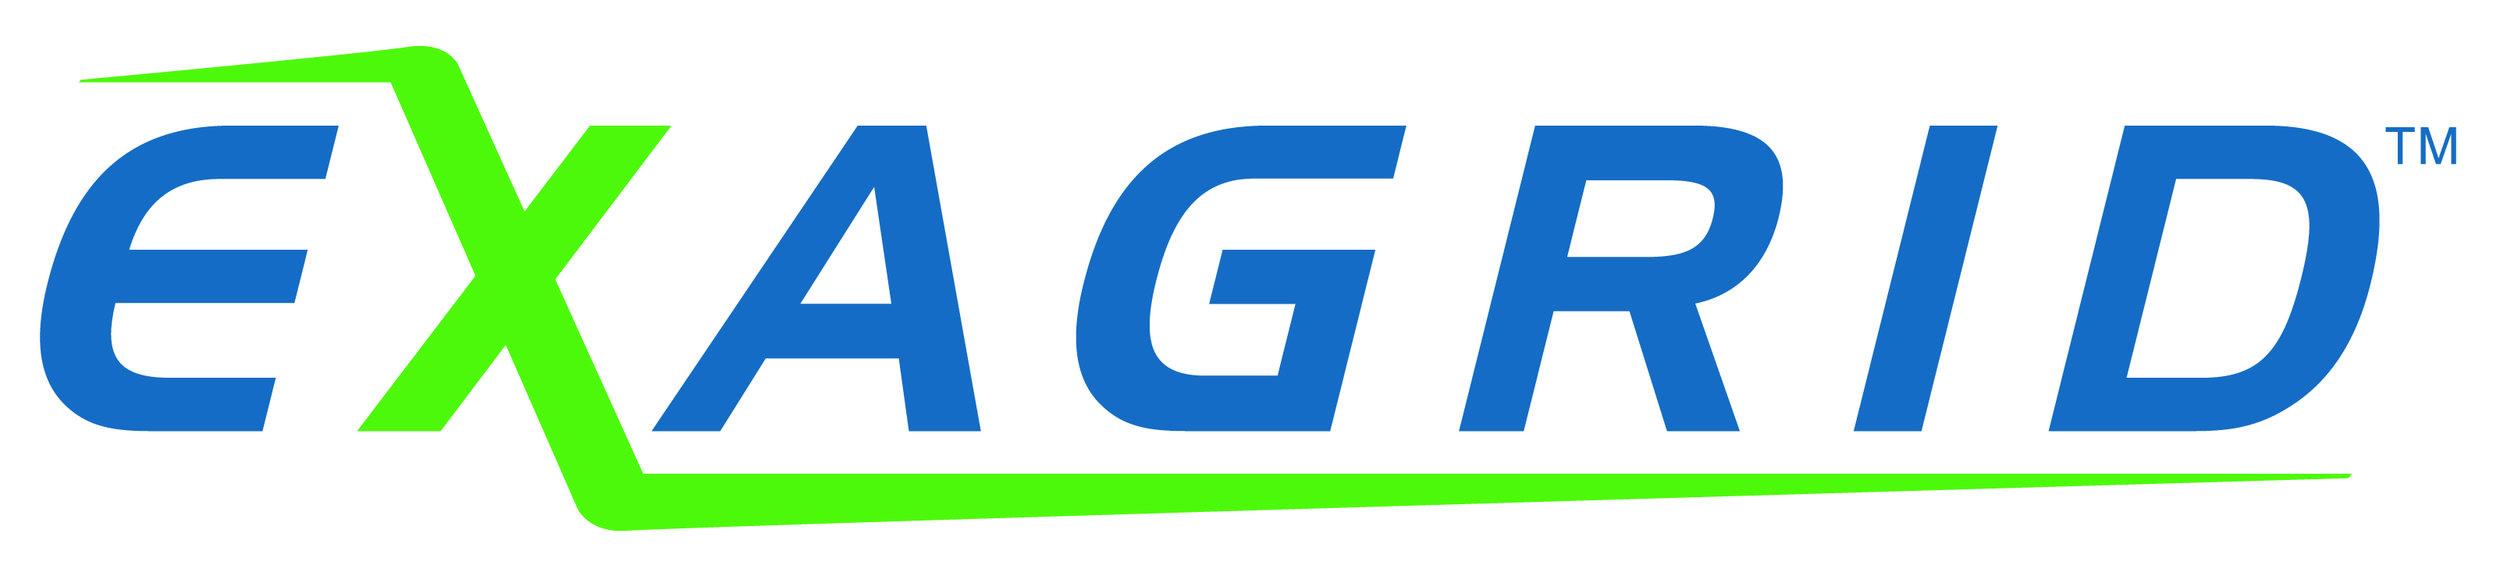 ExaGrid_Logo_2_Color_High_Res.jpg